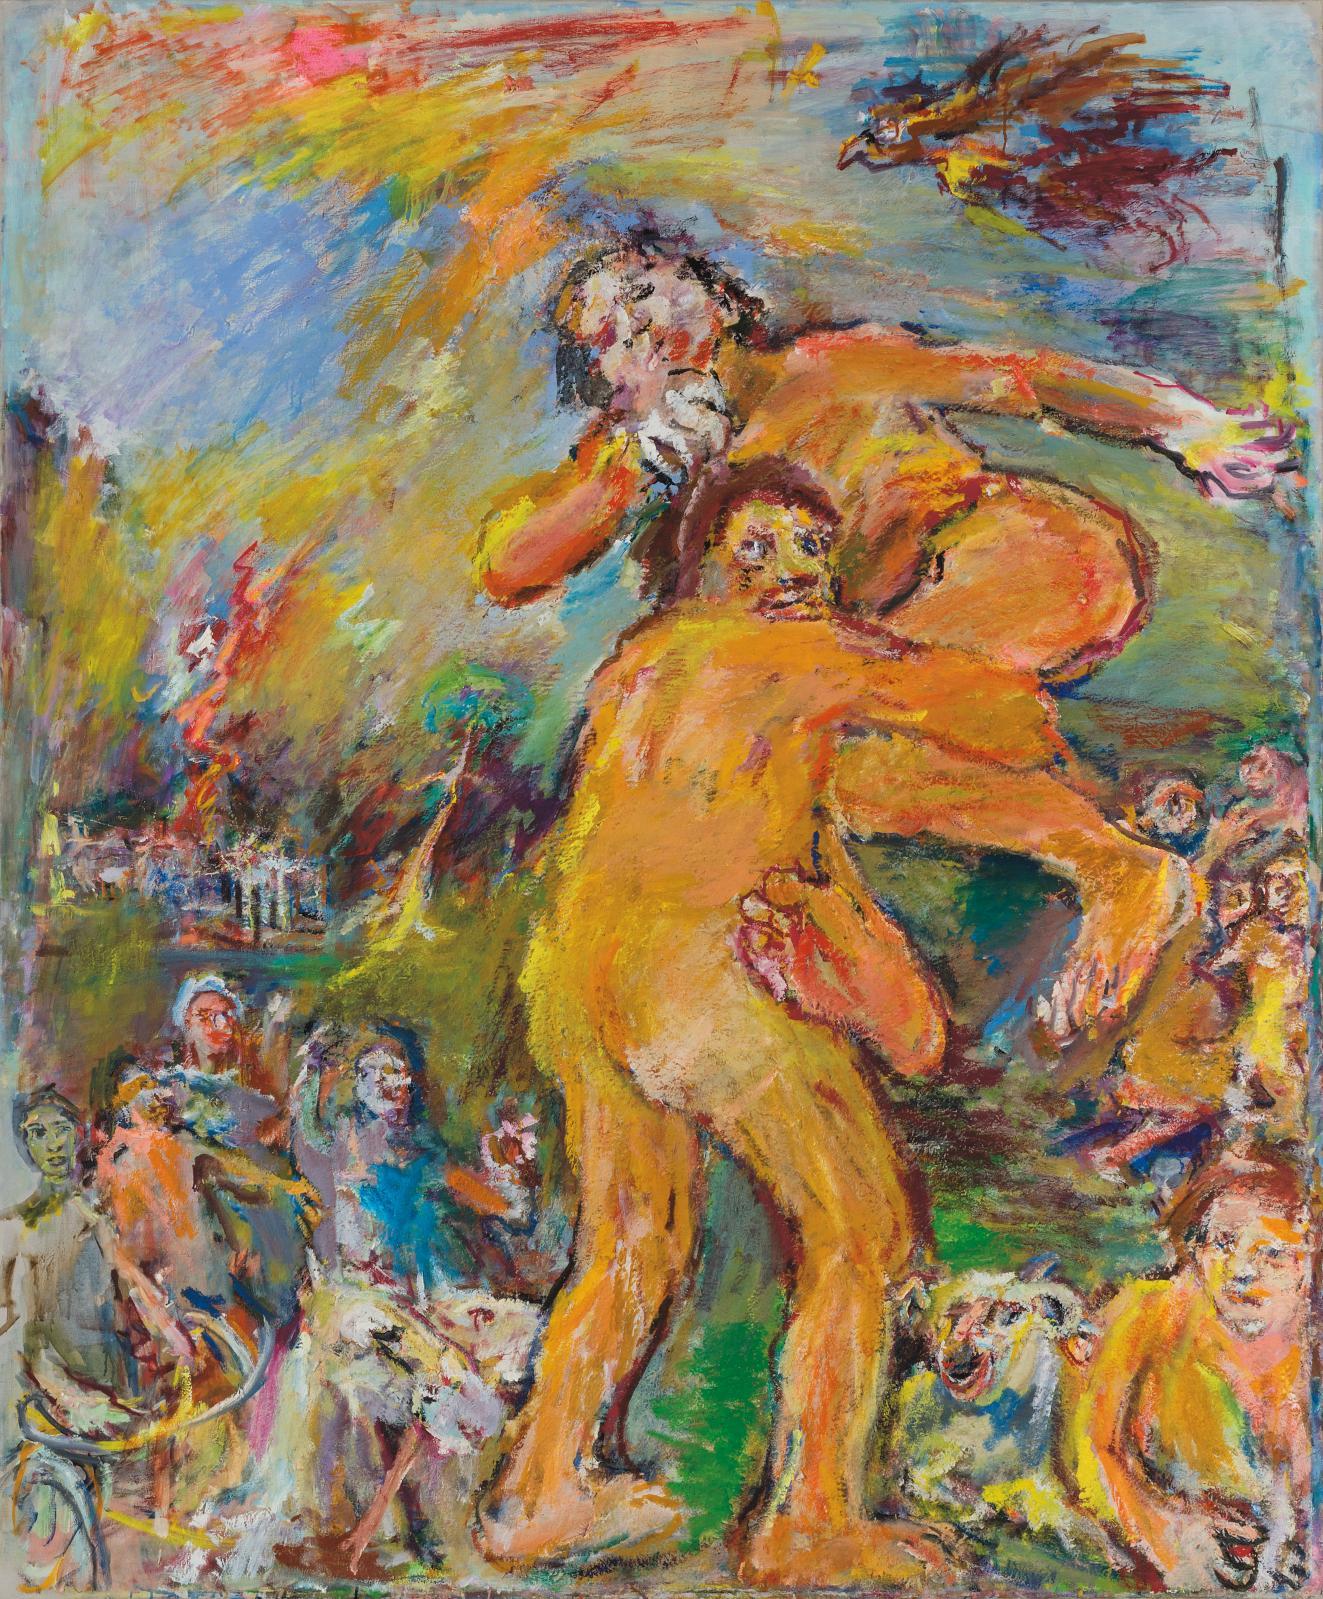 Oskar Kokoschka,Thésée et Antiope (Enlèvement d'Antiope), 1958-1975, huile sur toile, 195x 165 cm, fondation Oskar Kokoschka, musée Jeni